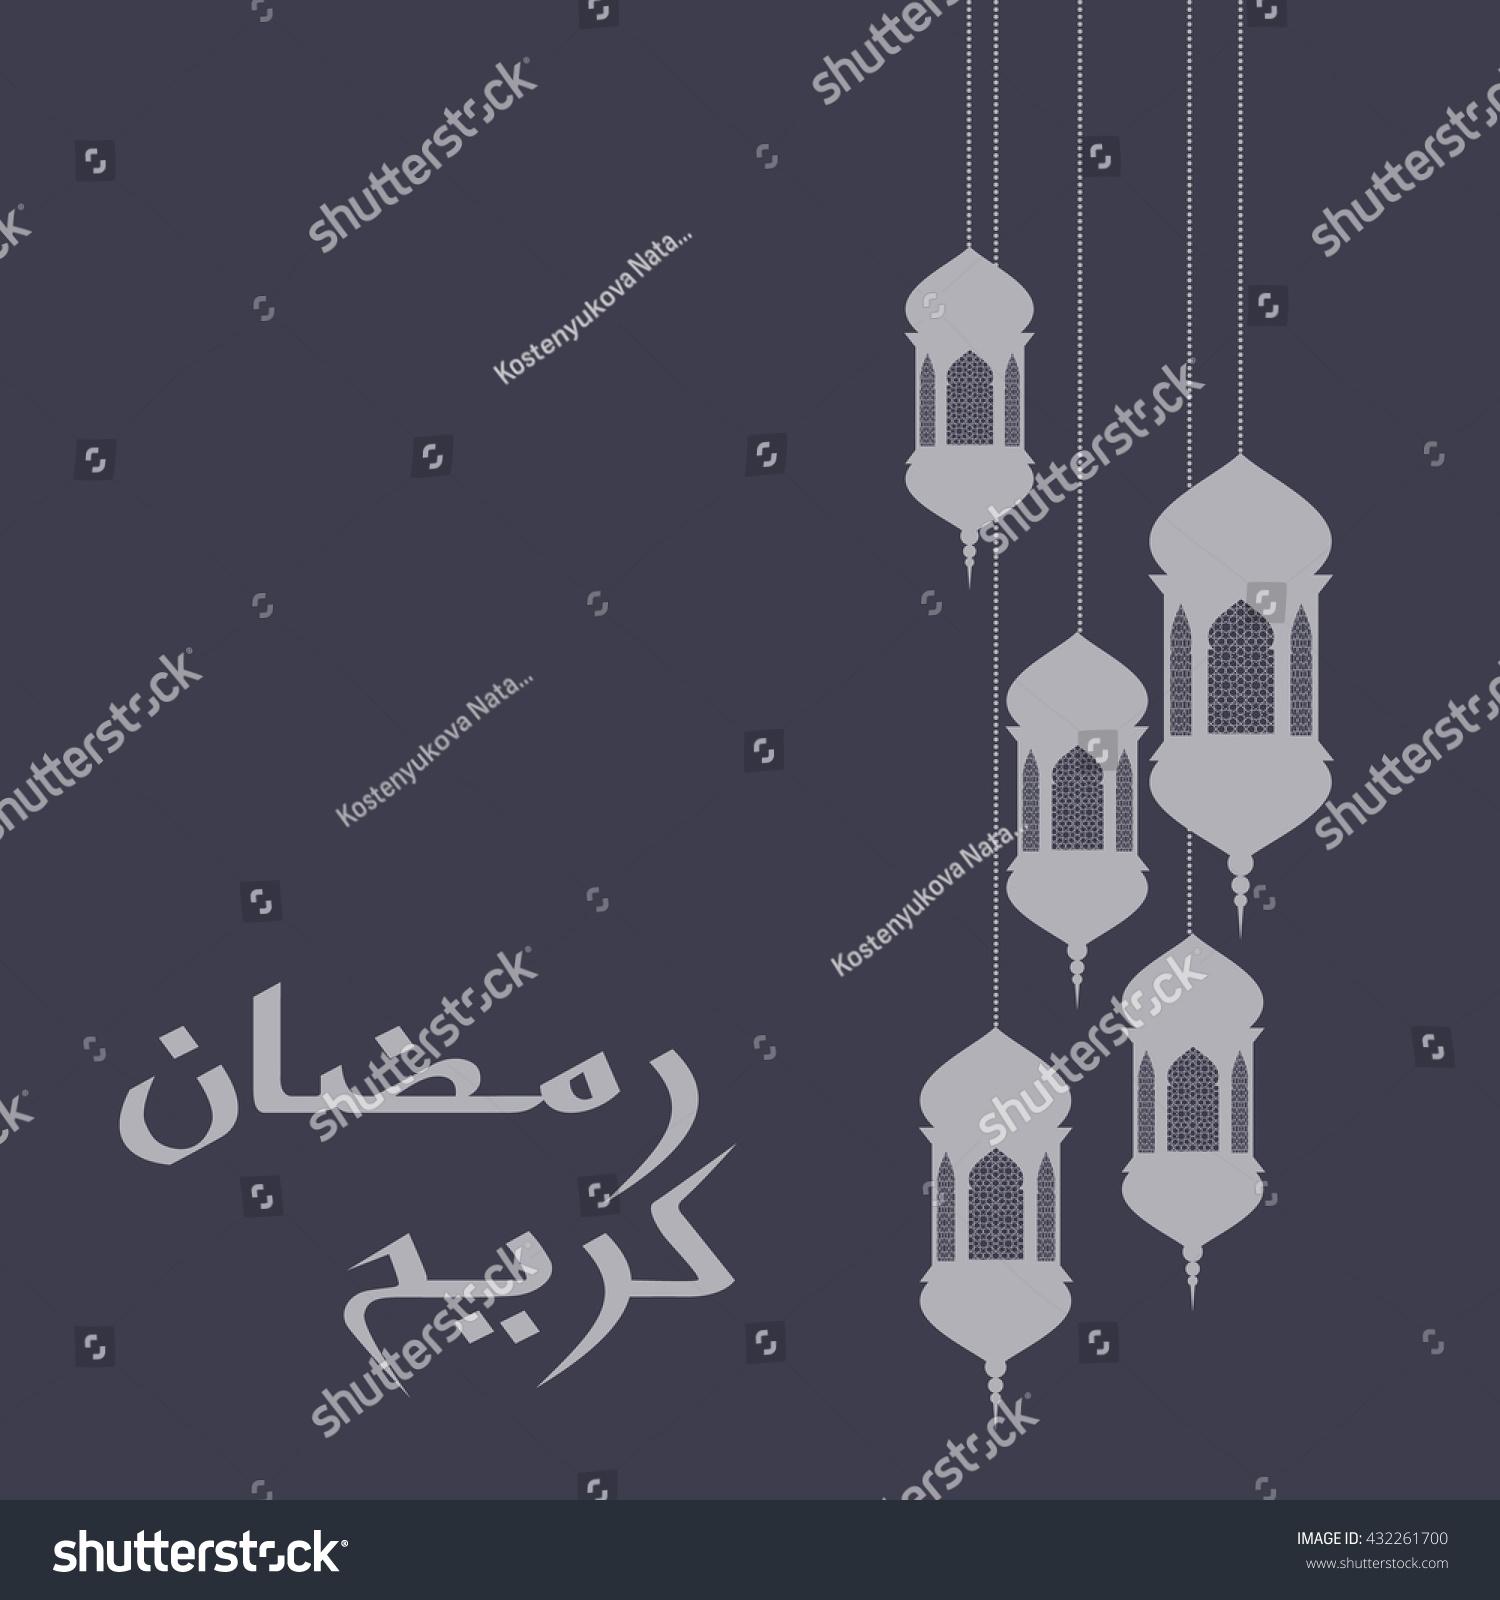 Ramadan greeting card on grey background stock illustration ramadan greeting card on grey background ramadan kareem means ramadan is generous kristyandbryce Image collections